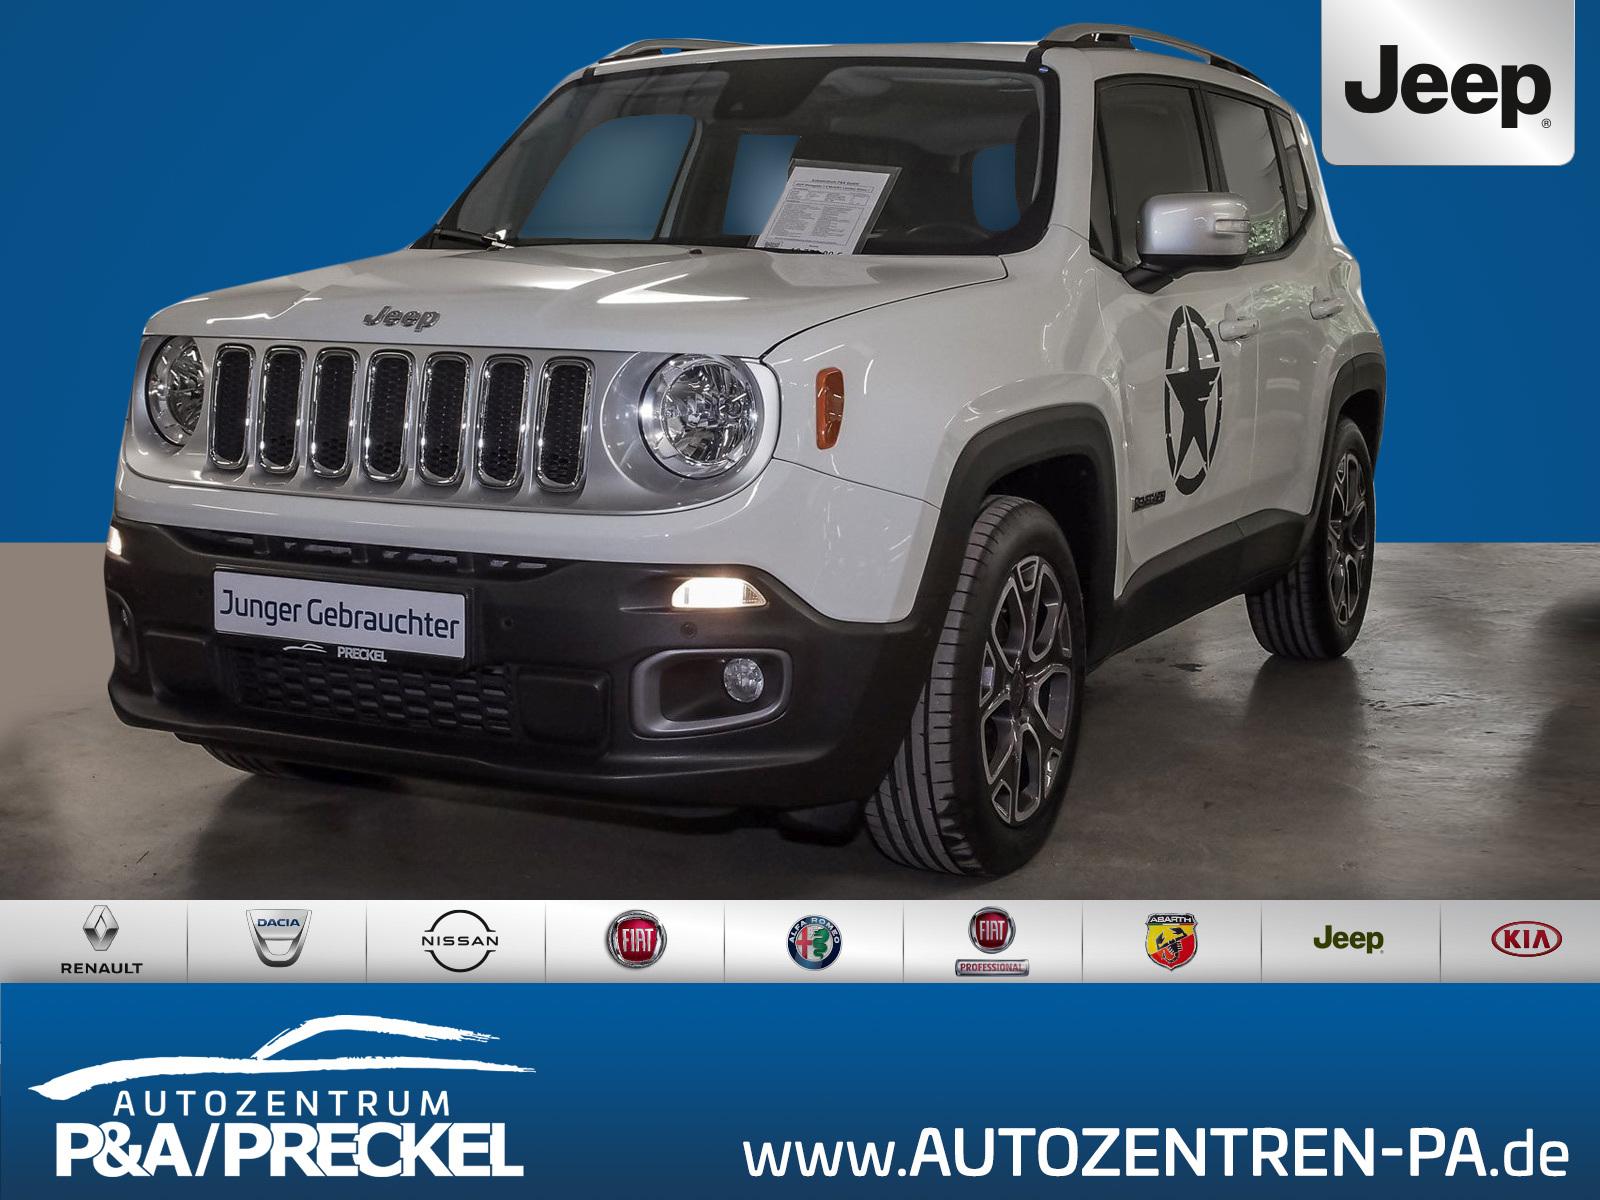 Jeep Renegade 1.4 Limited /Navi/PDC/Spurassist/DAB/, Jahr 2017, Benzin